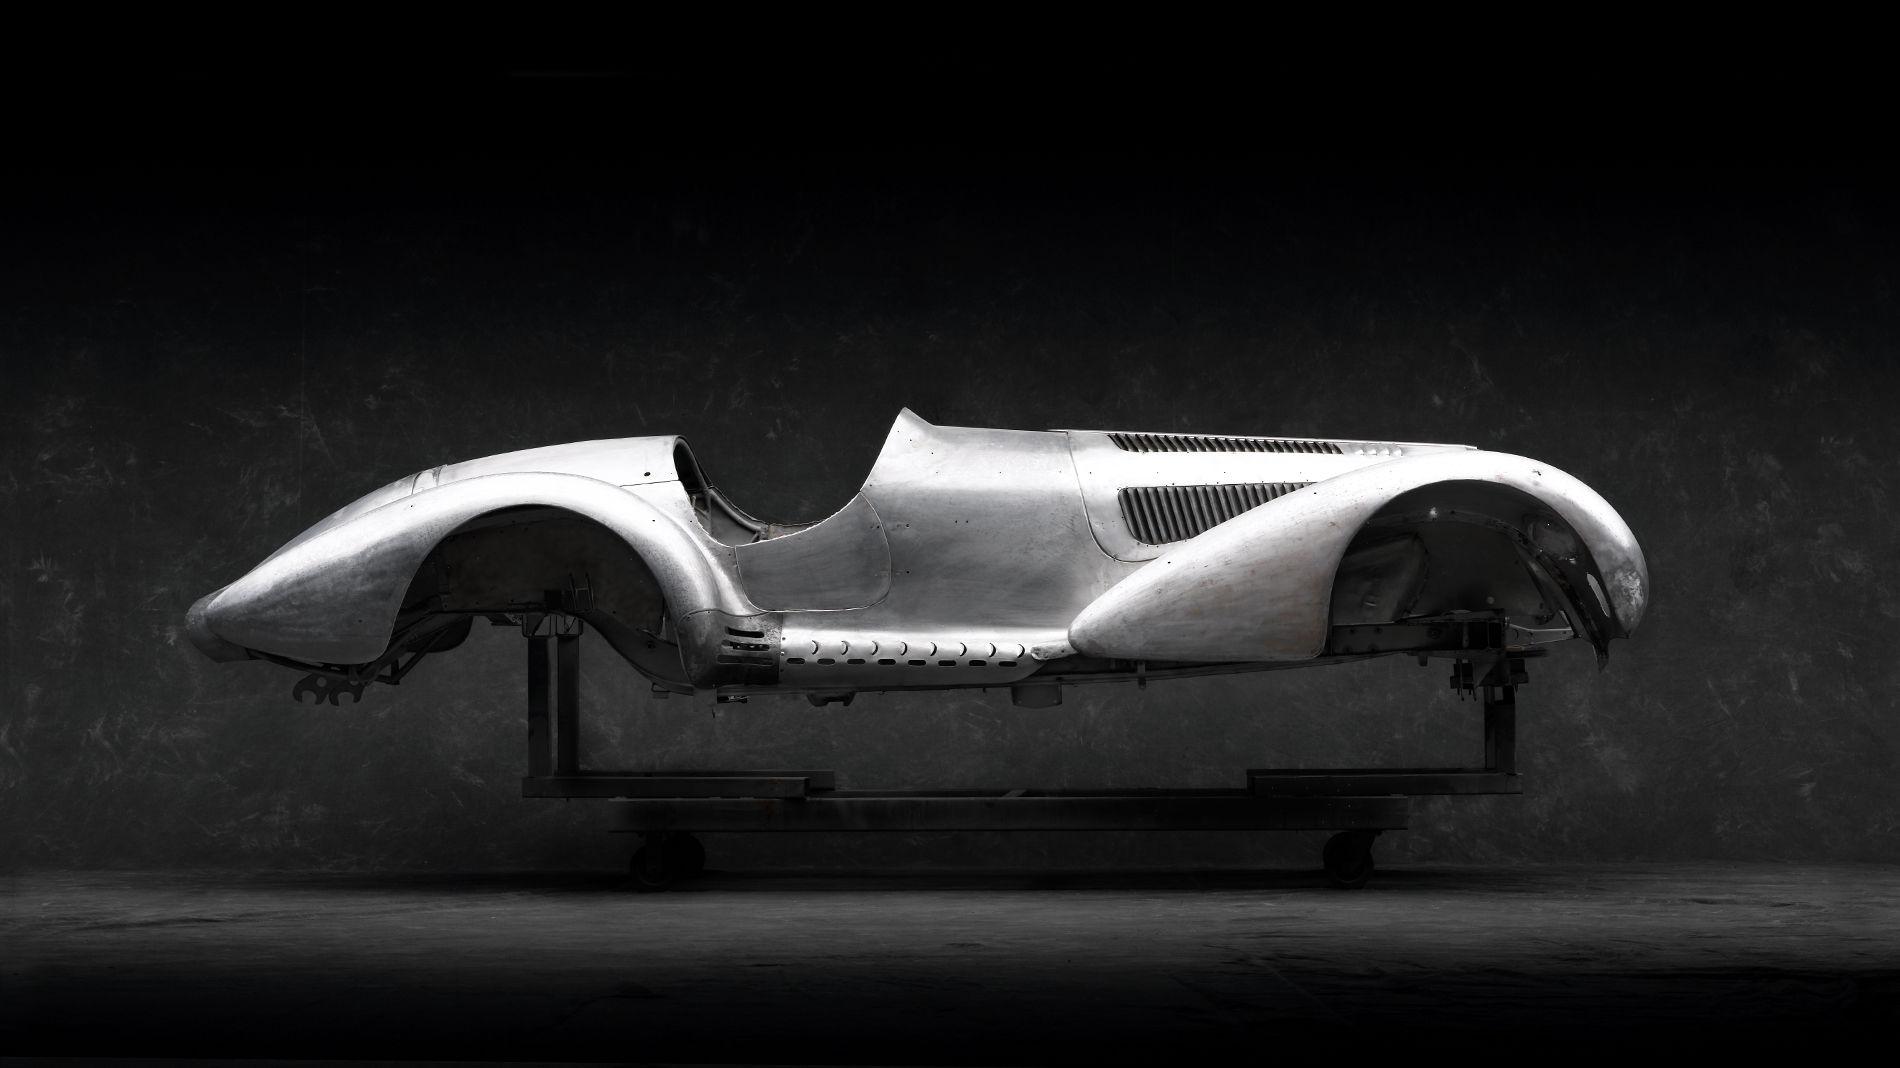 The frame of a vintage race car